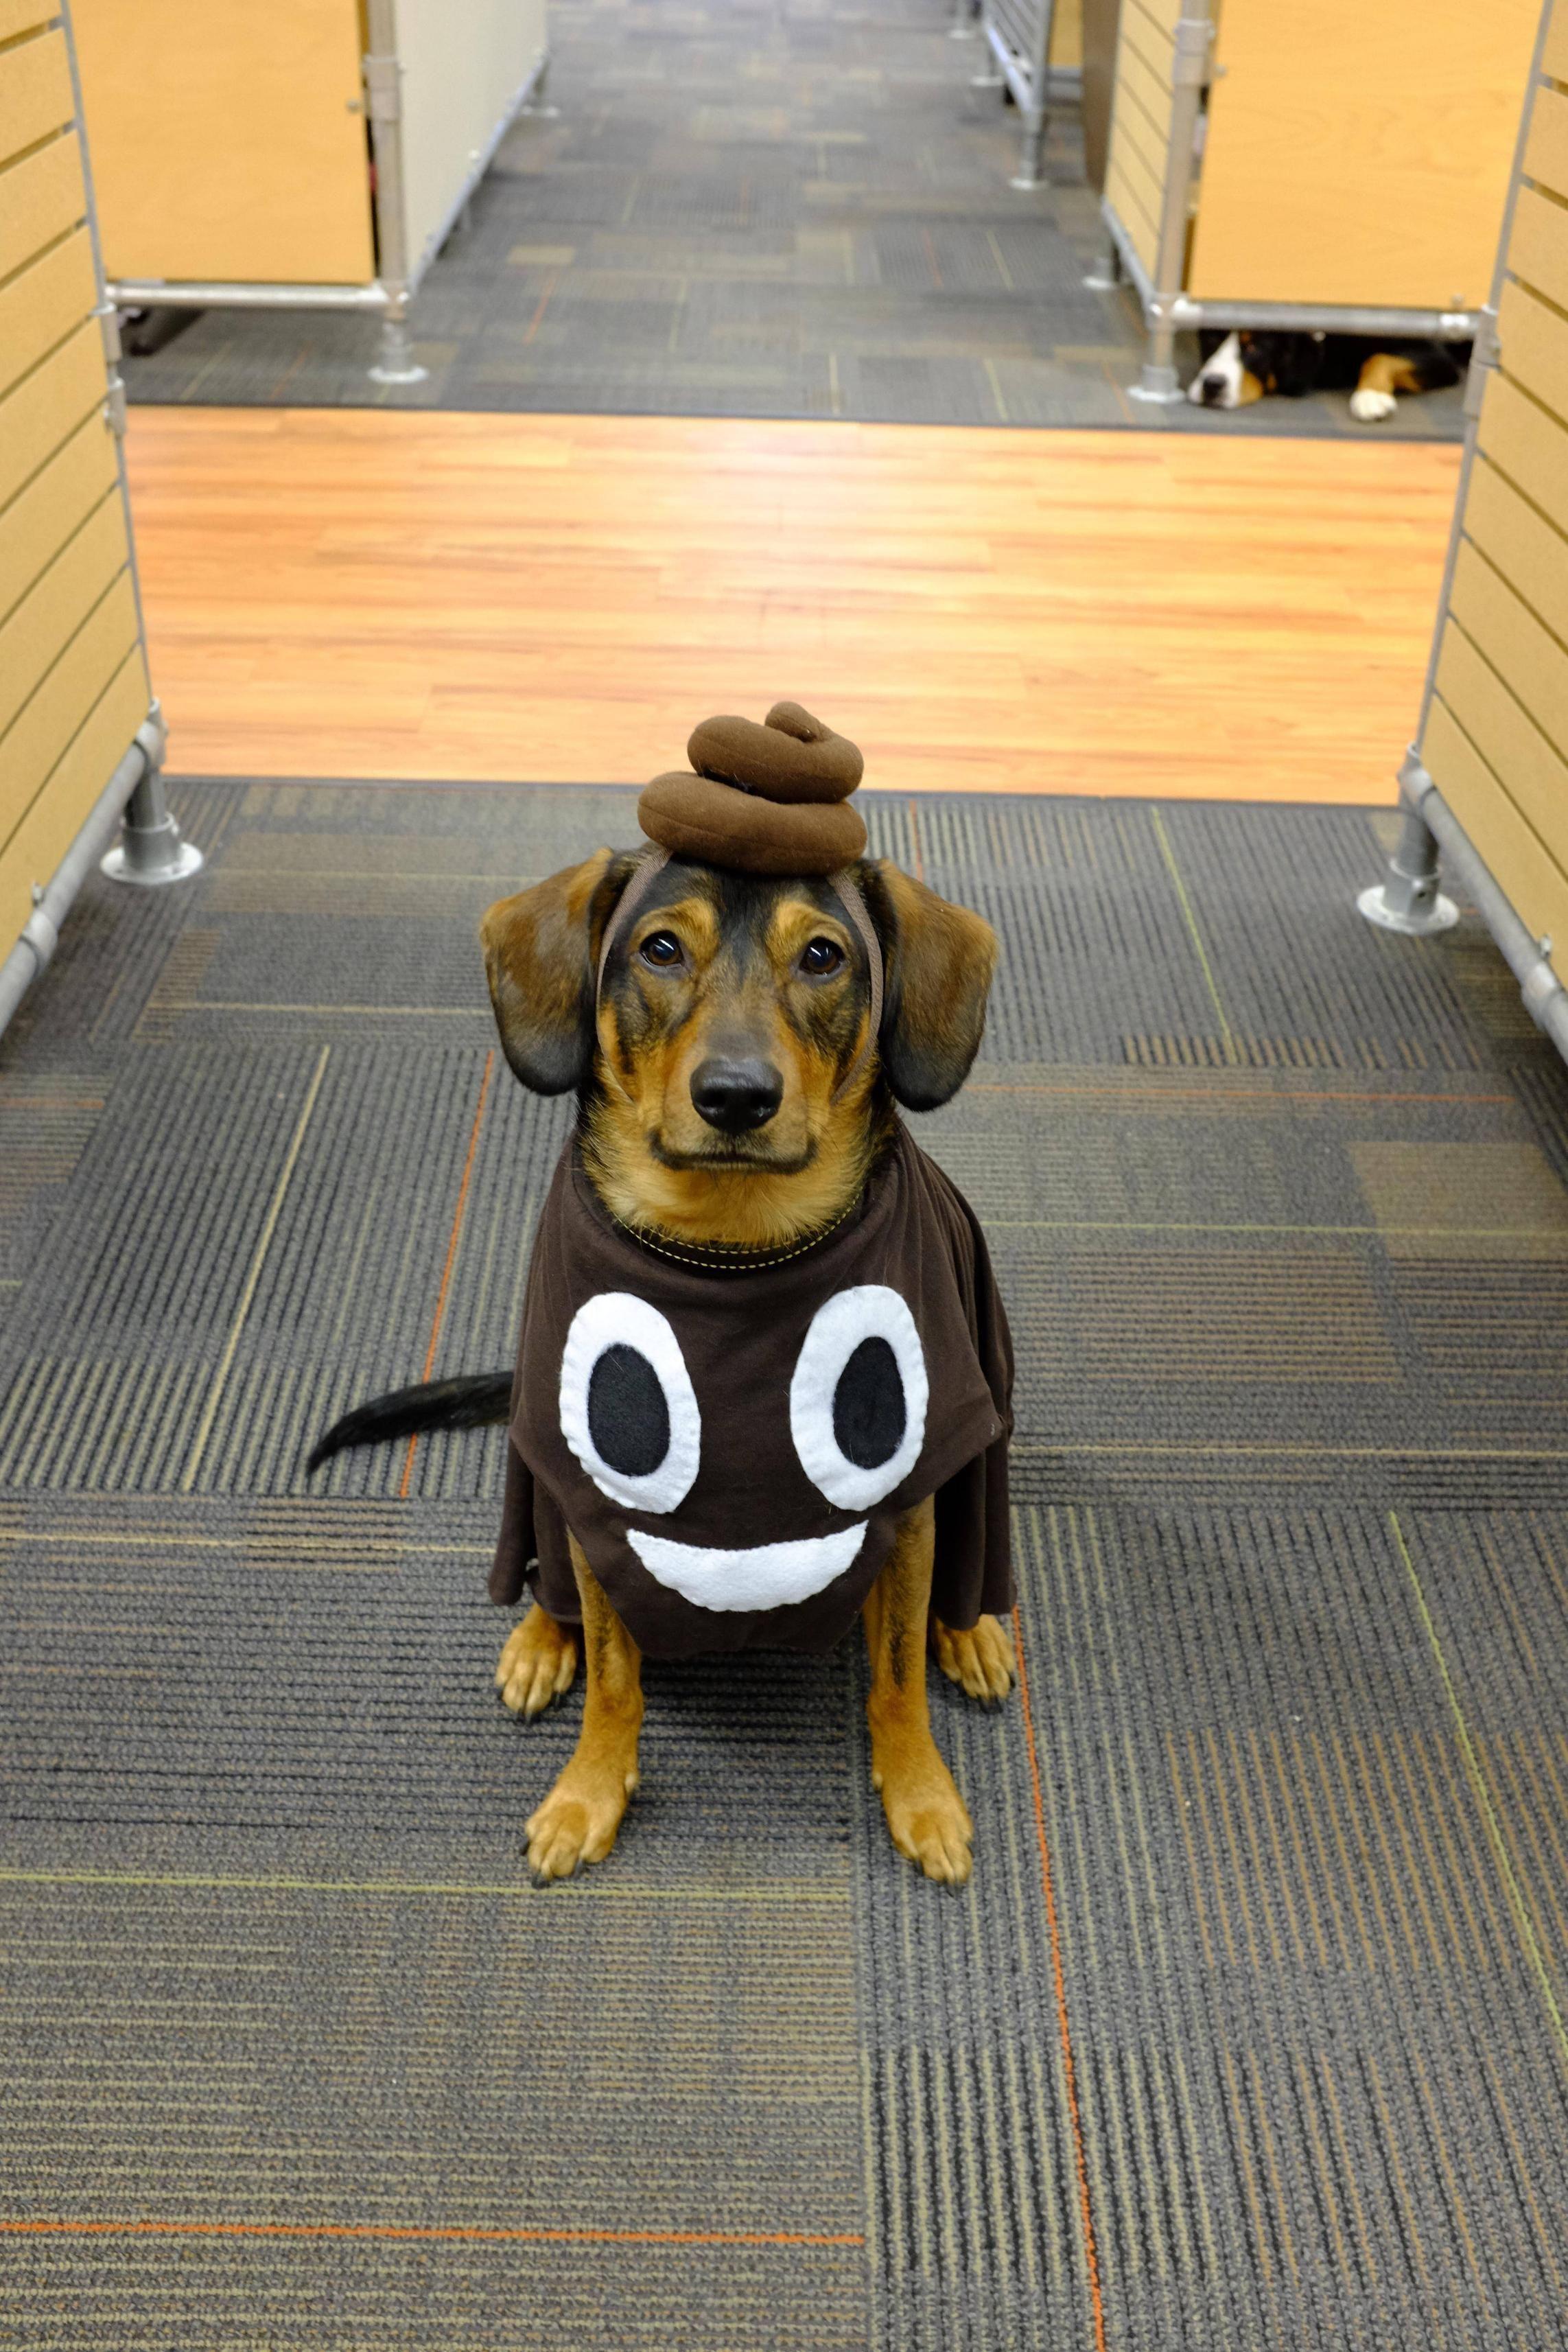 The poop emoji the best dog halloween costume iuve done yet